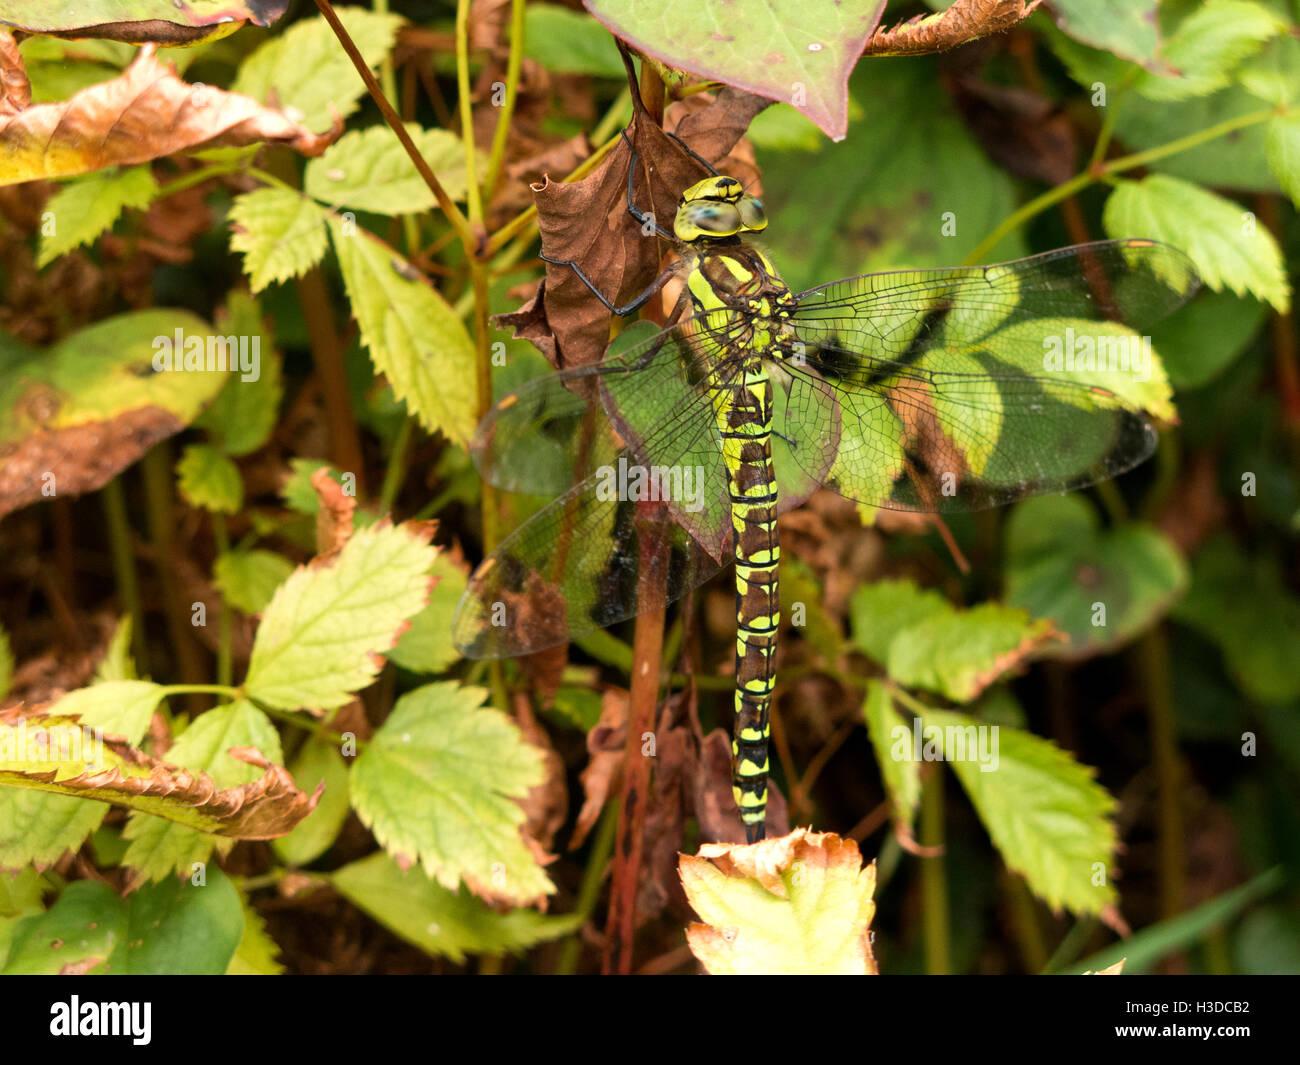 Gemeinsamen Hawker Libelle weiblich Stockbild